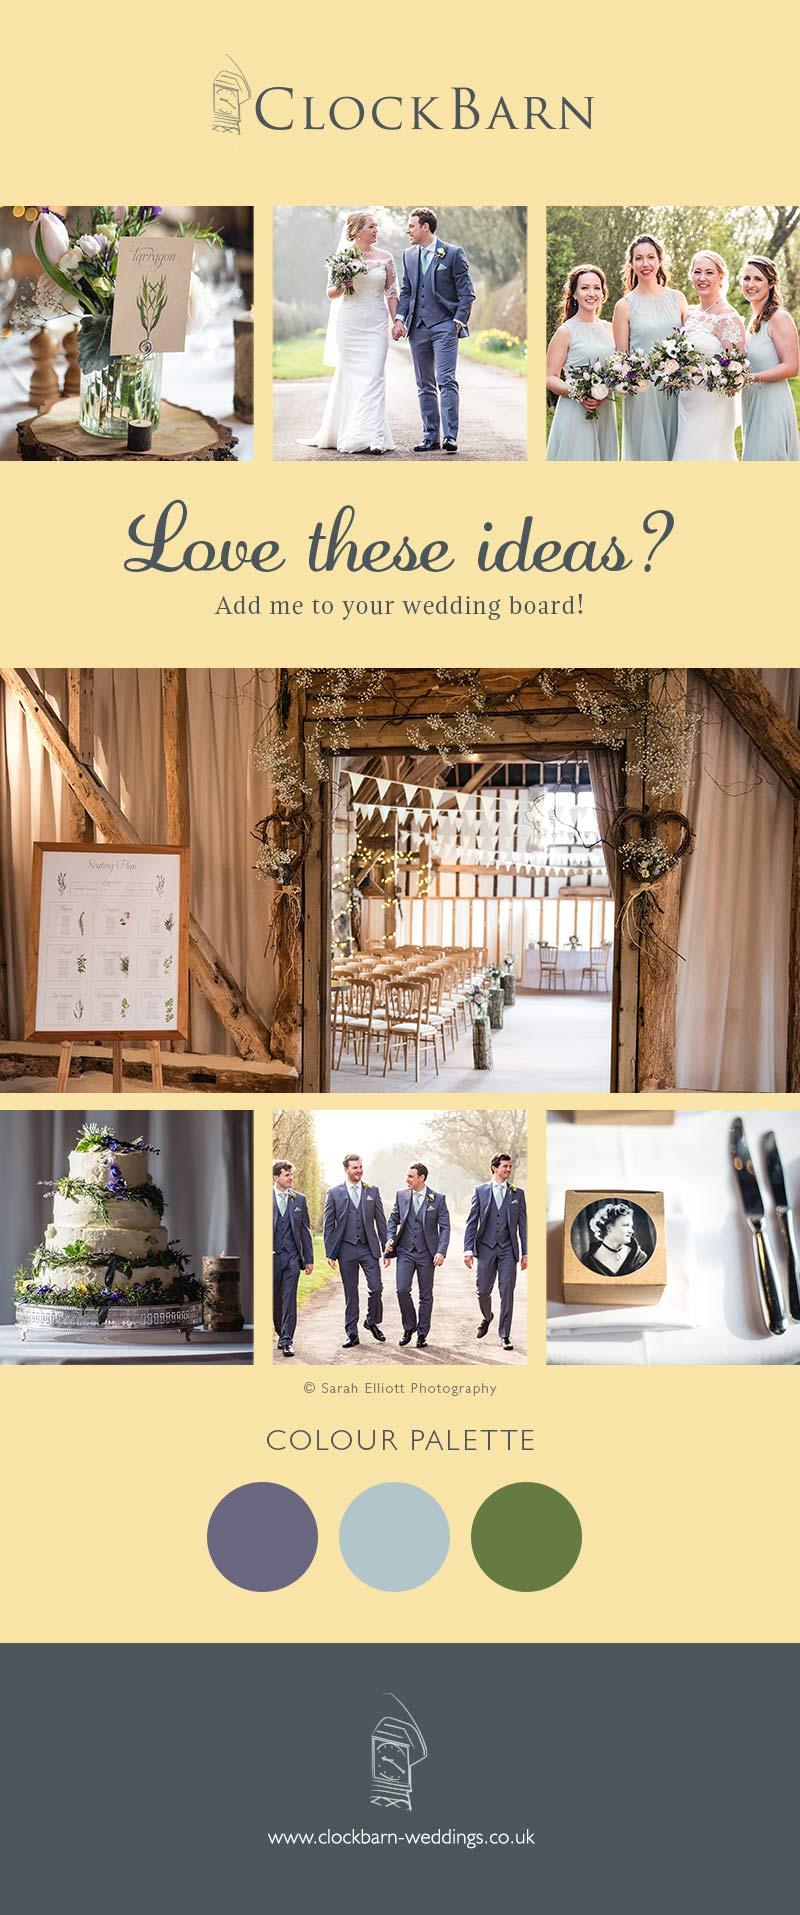 Emily & Tom Clock Barn wedding